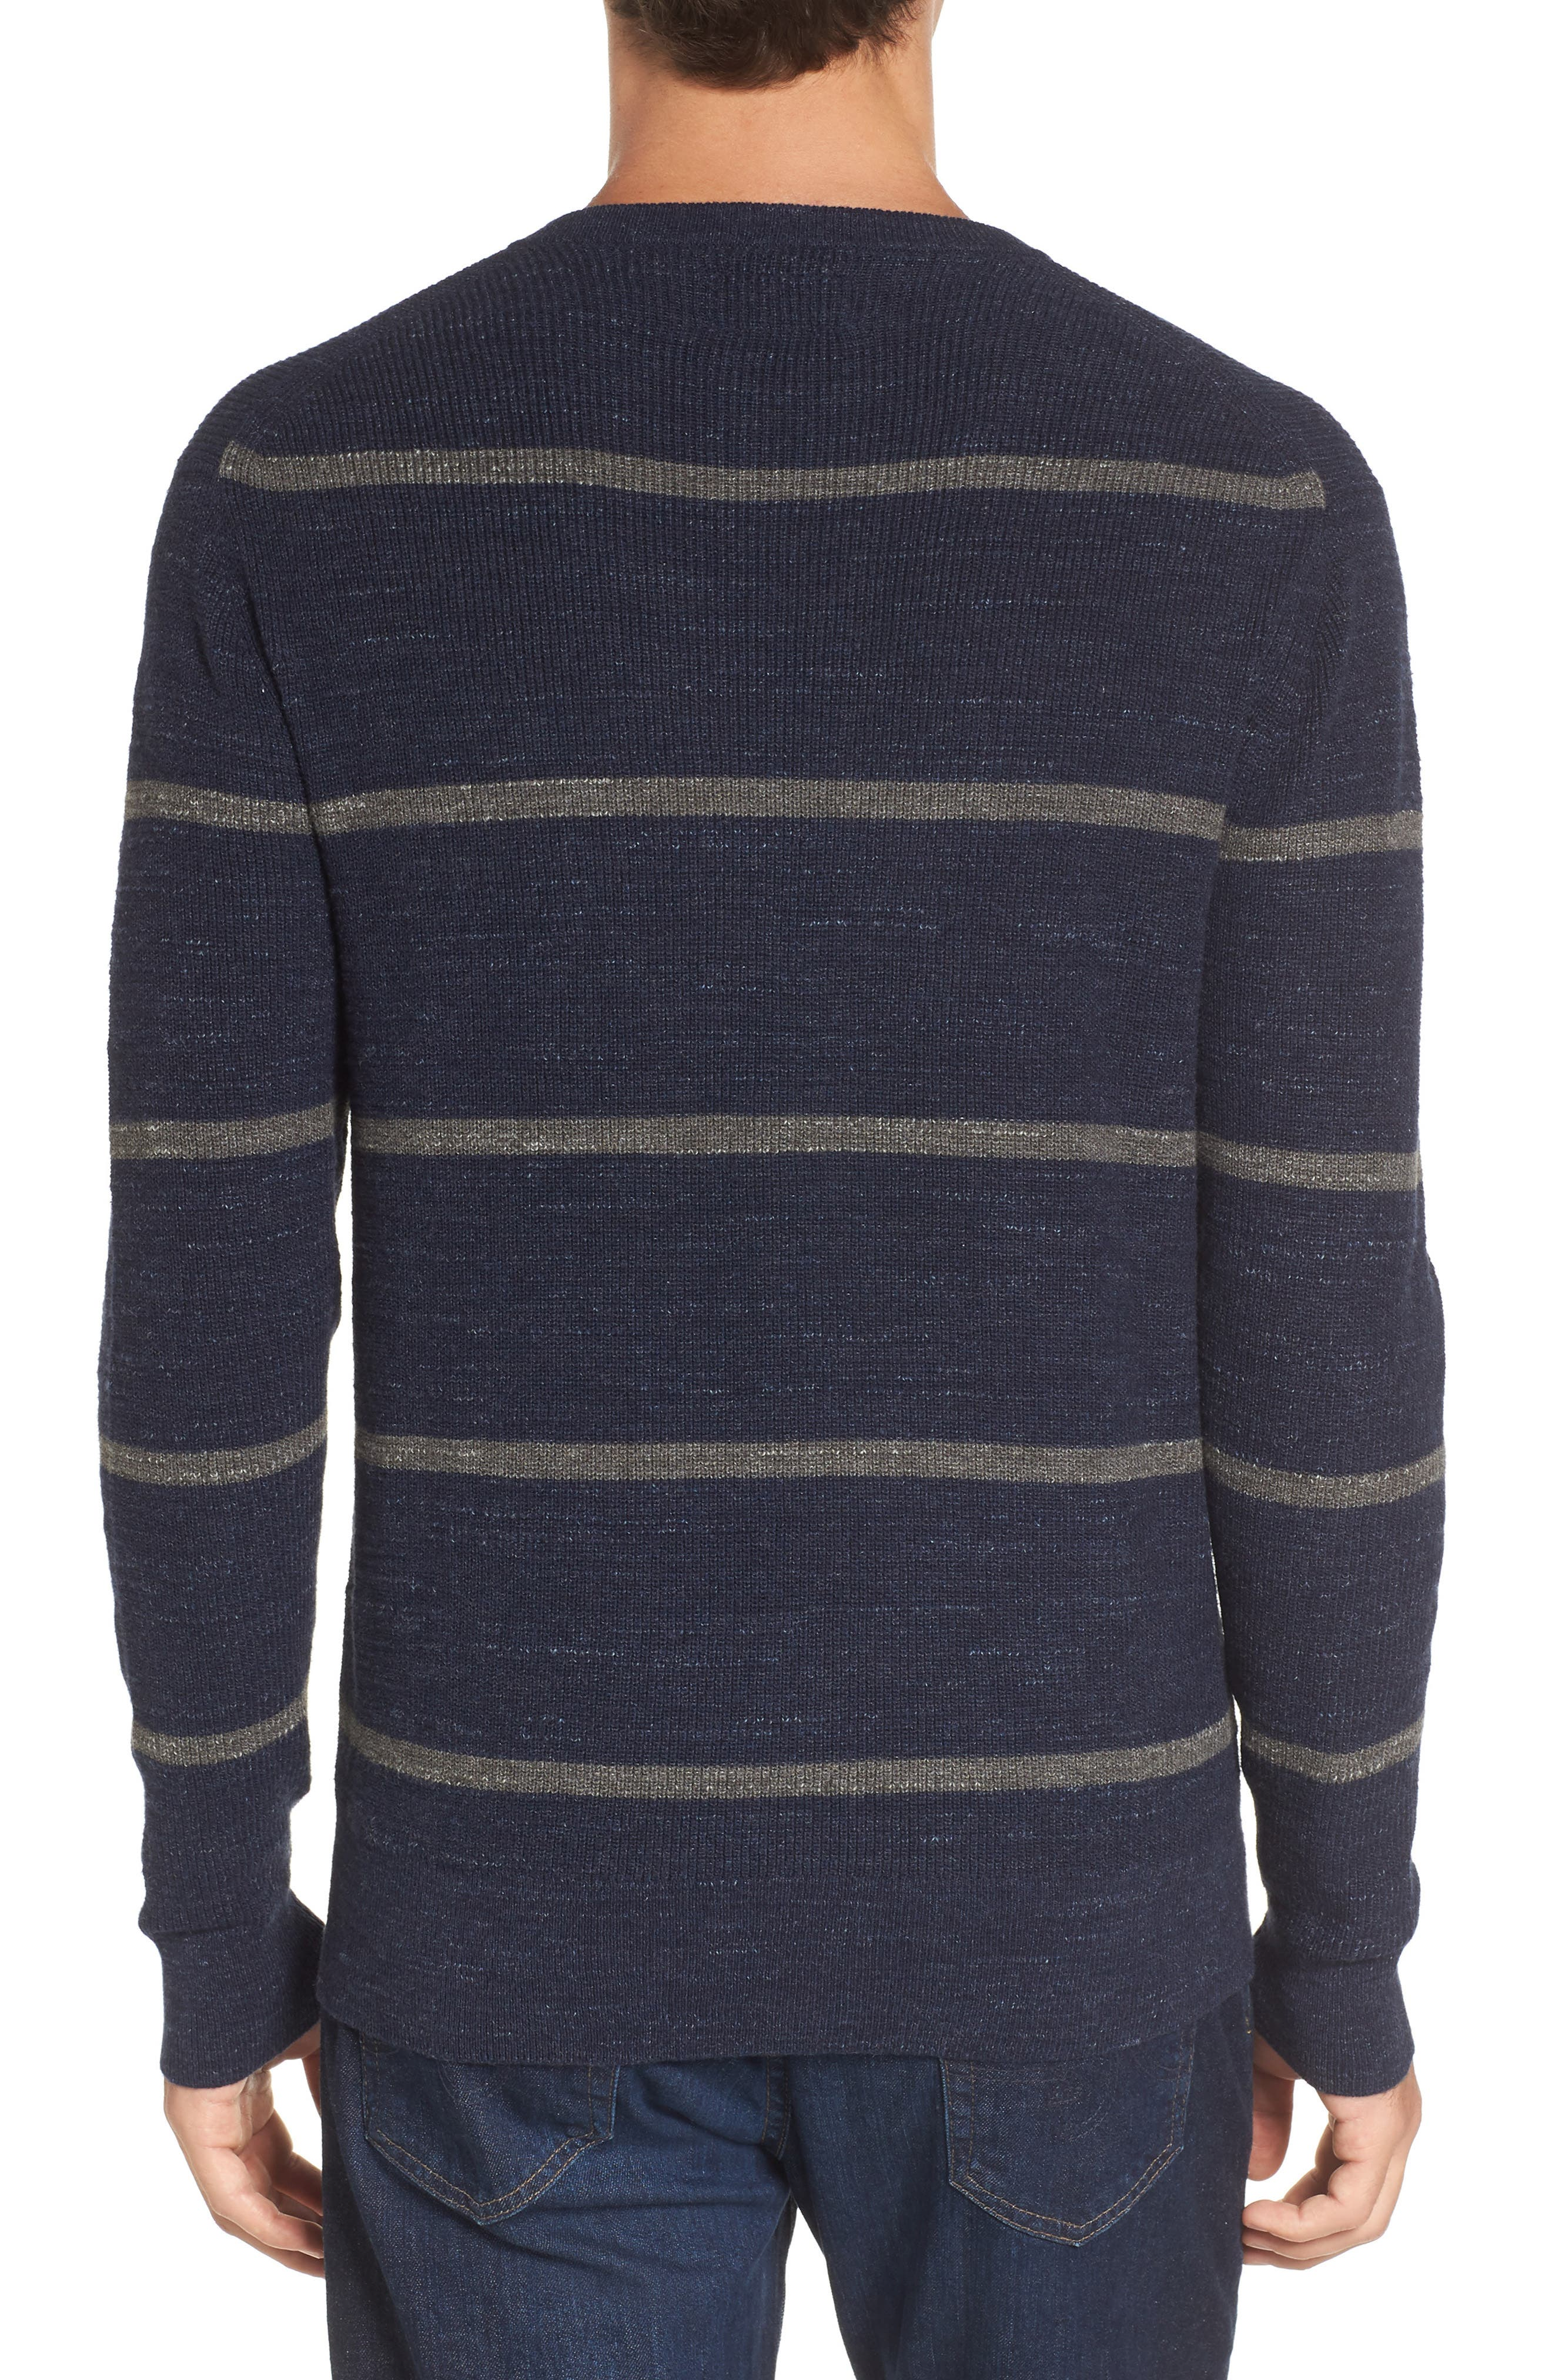 Ardsley Stripe V-Neck Sweater,                             Alternate thumbnail 2, color,                             Navy/Light Charcoal